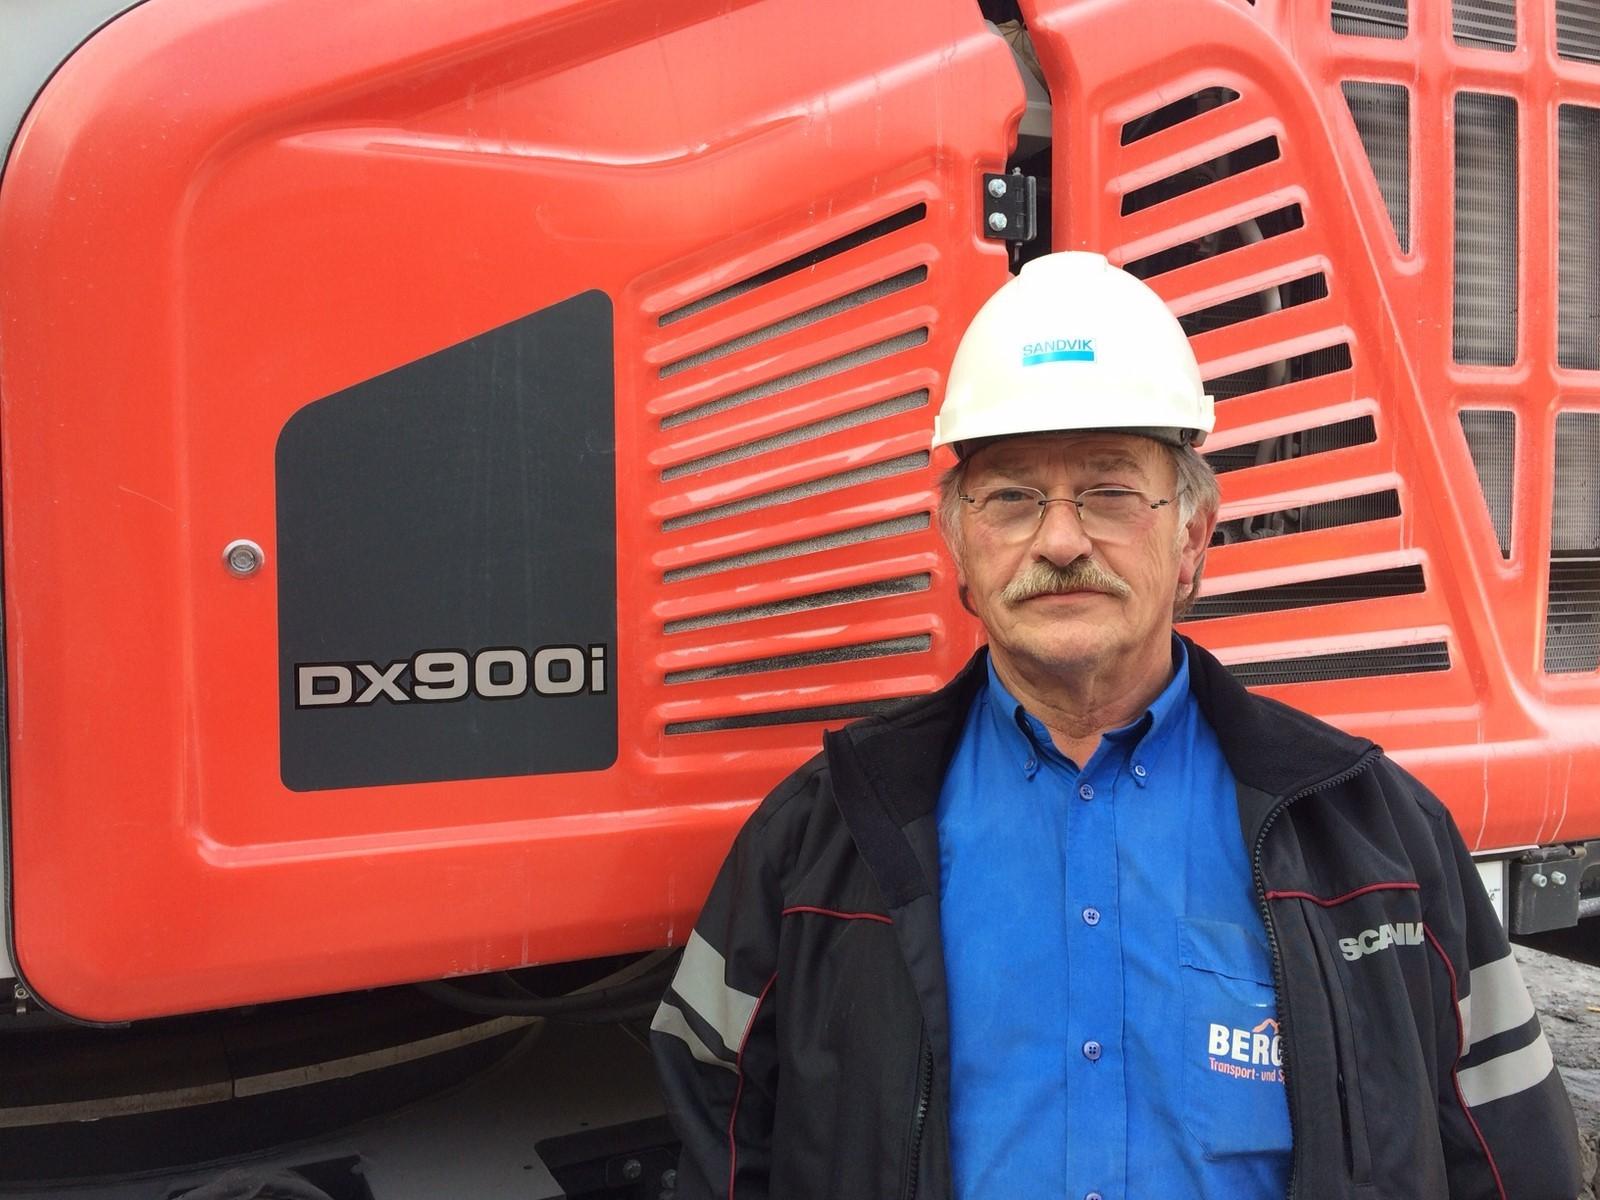 Sandvik Ranger DX900i - Sandvik - Baumaschinen & Bau Forum